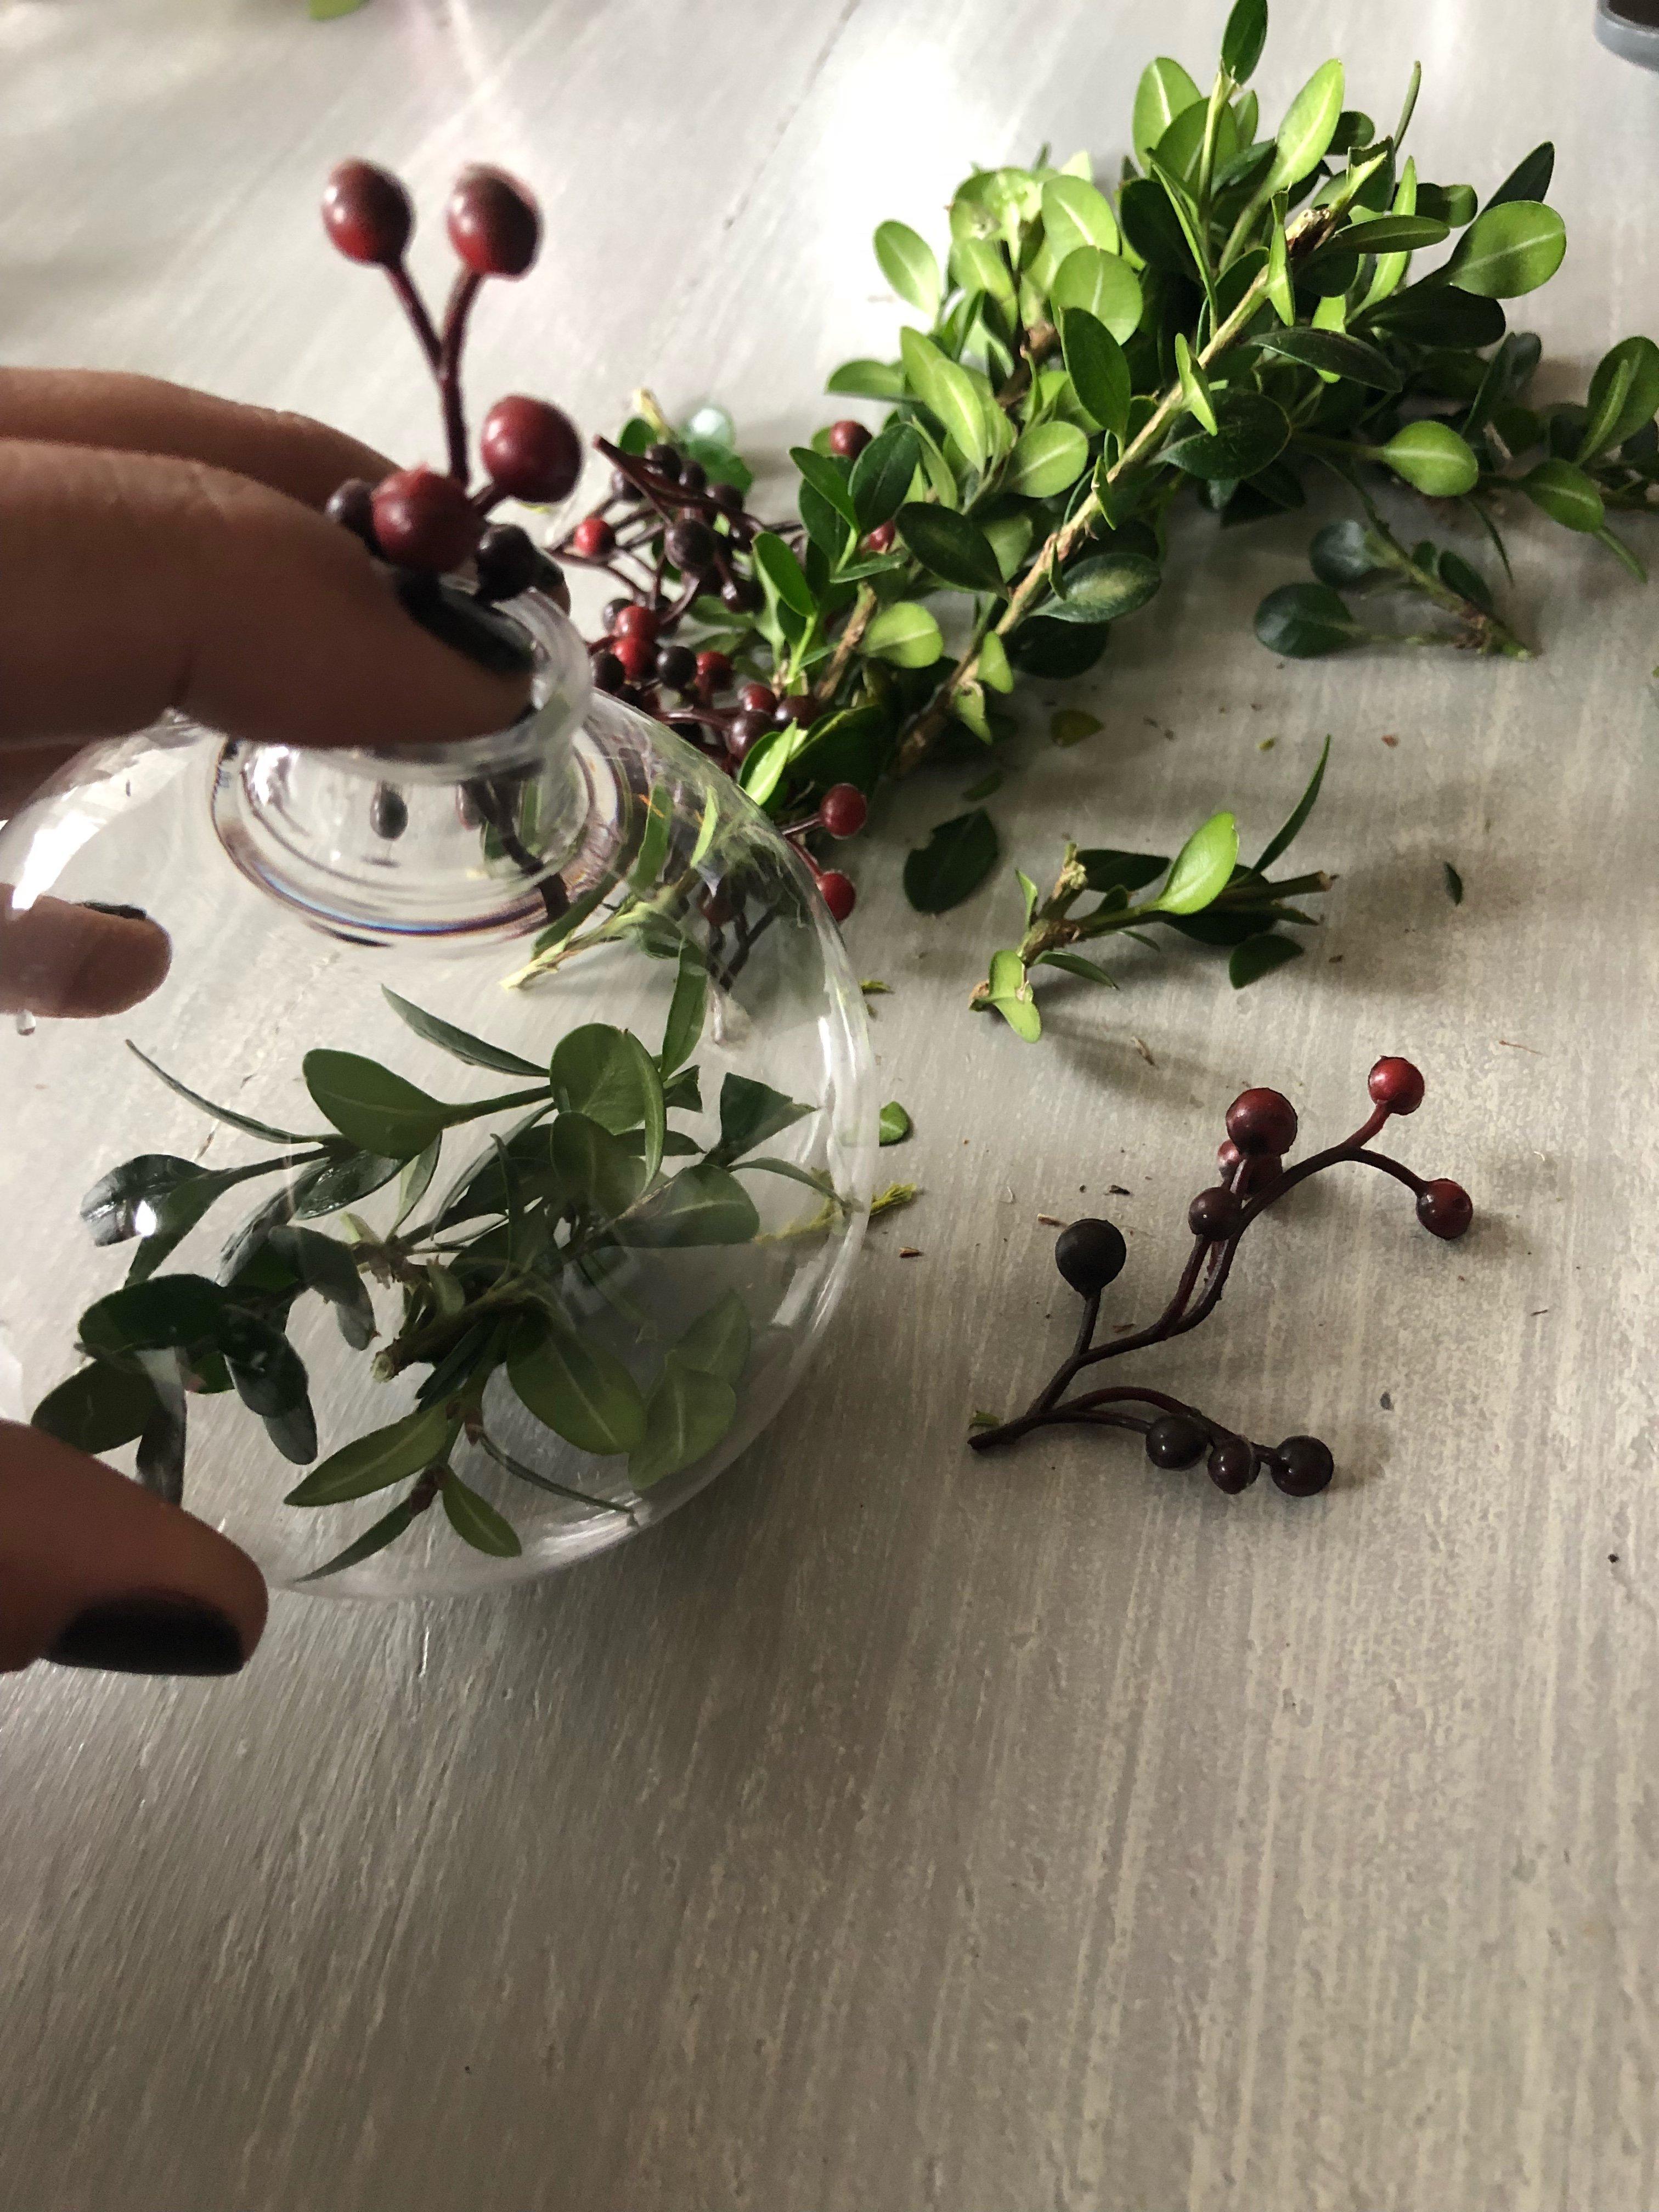 DIY Christmas ornaments using real greenery inside plastic ornaments